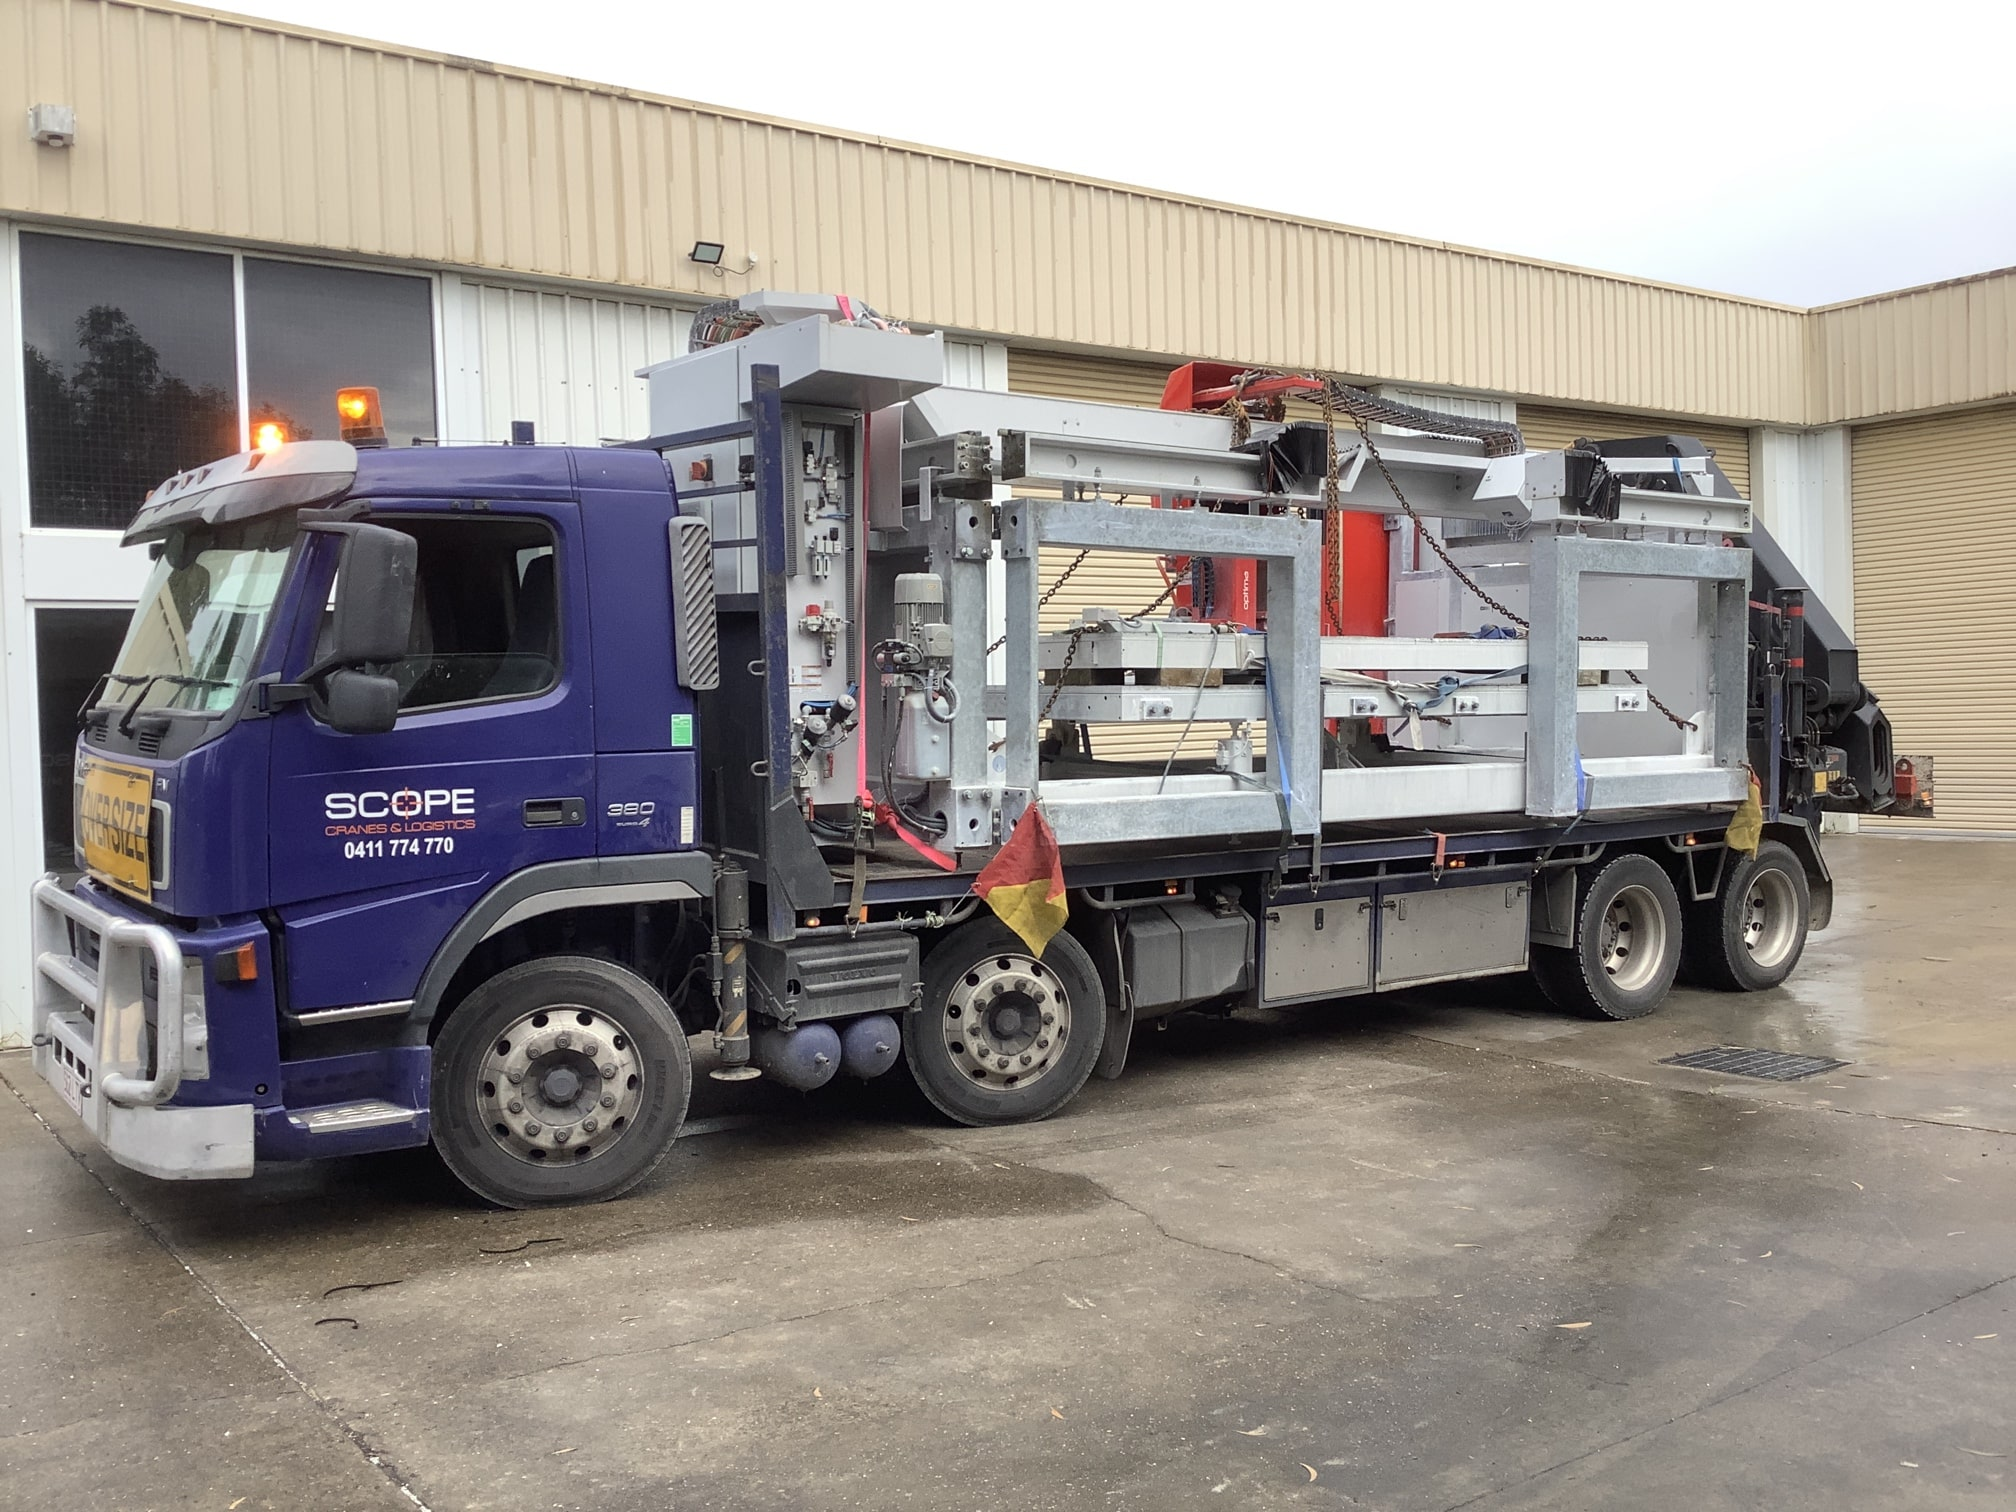 scopecranes hiring crane truck hire move stone bench saw